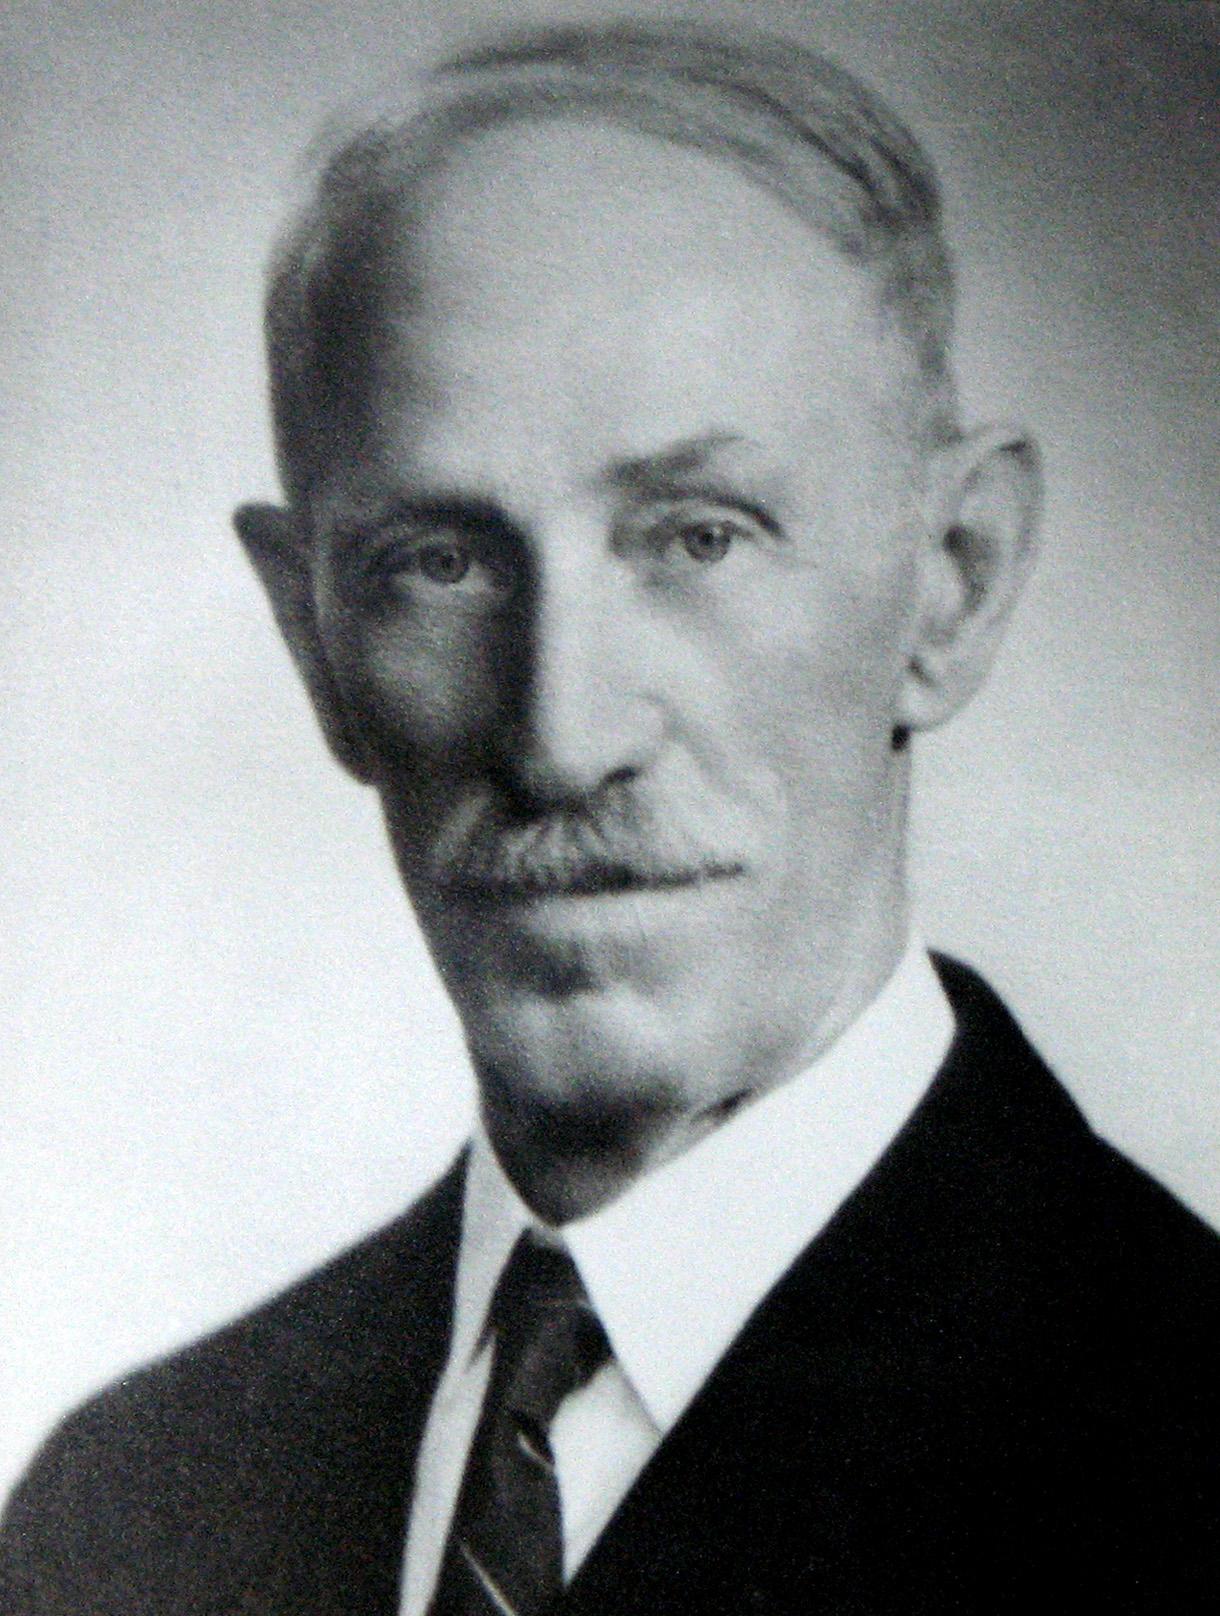 Mayor Pierre Lemieux